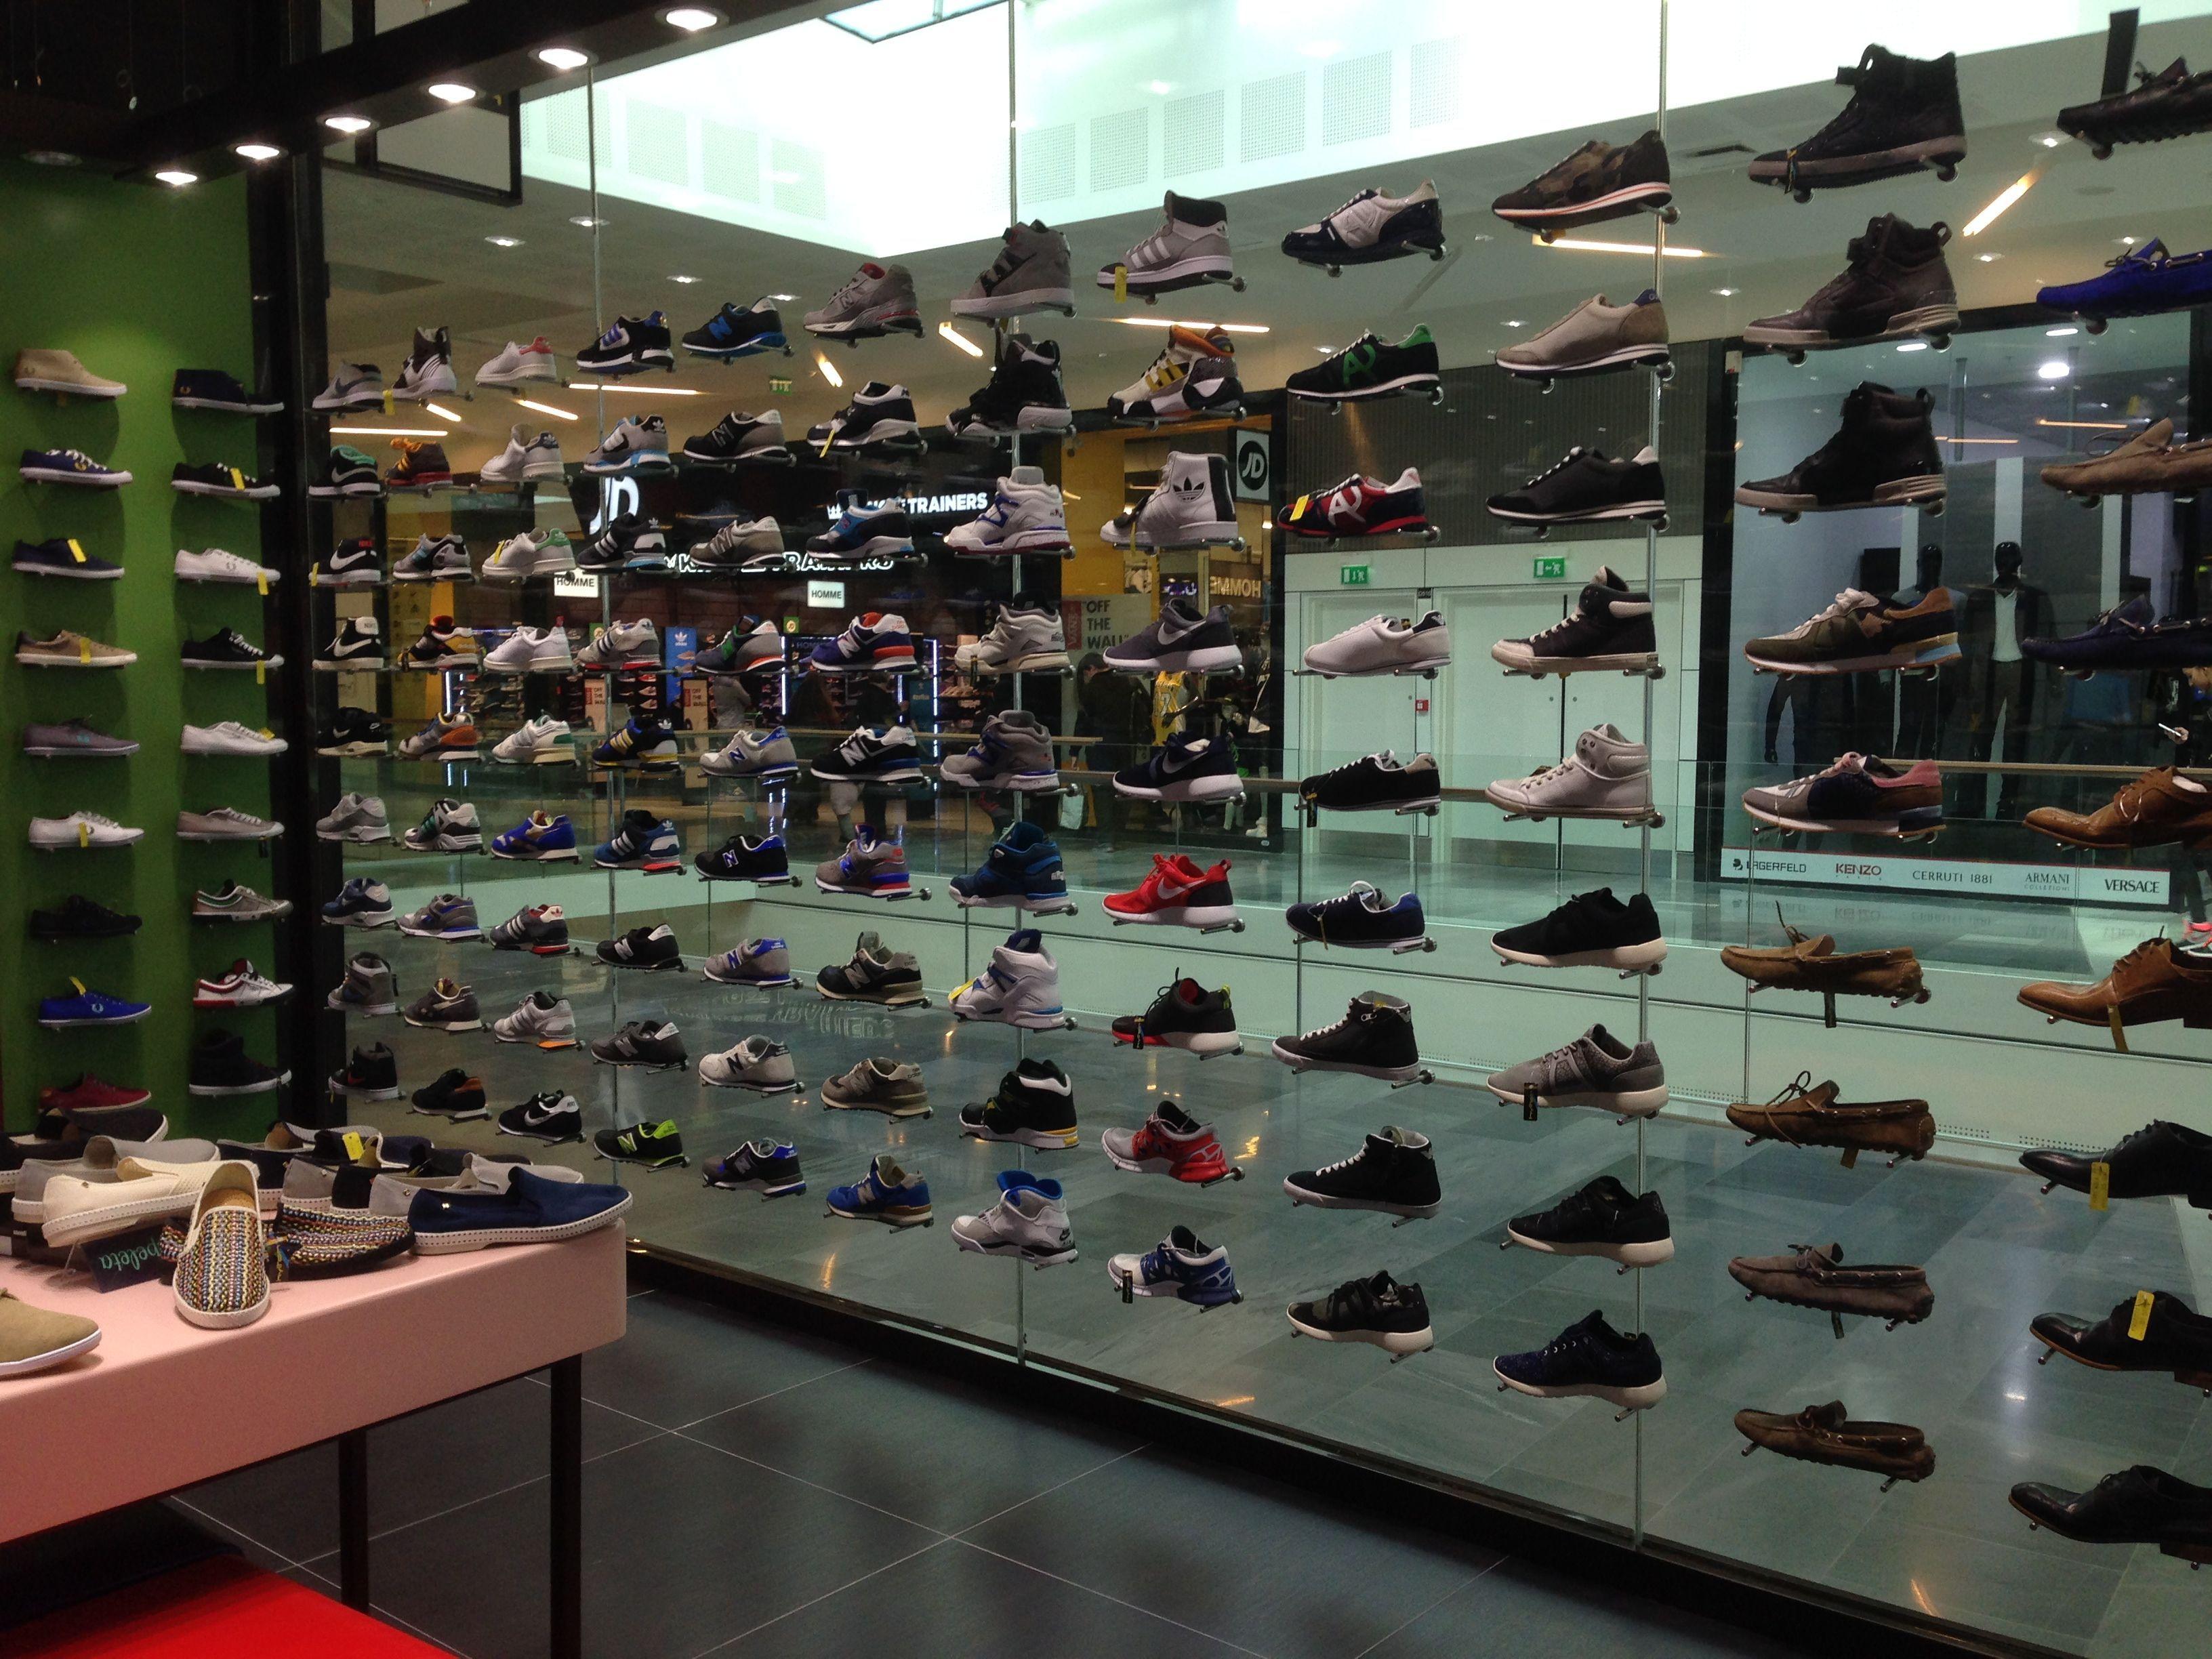 grande vente 0e8e9 085f5 hylton #qwartz | Store : Hylton